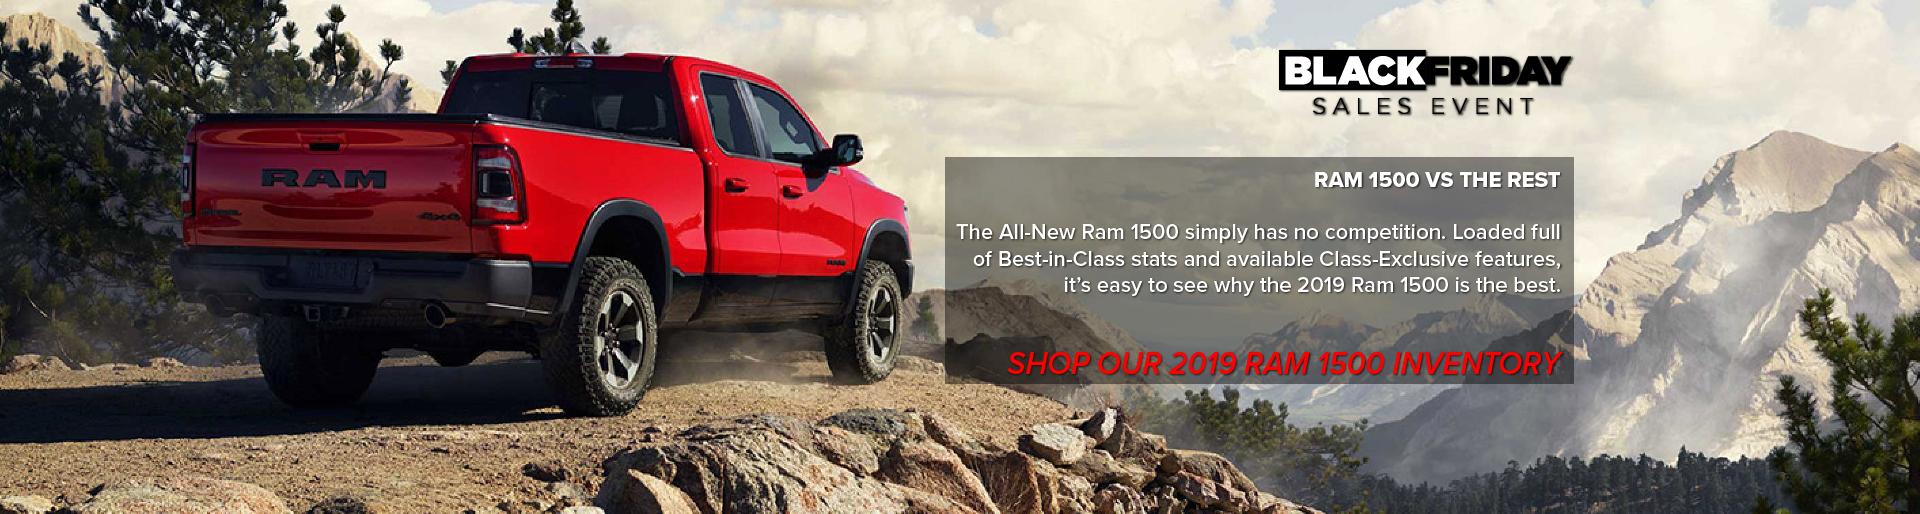 Tanner Motors RAM 1500 Black Friday Sales Event